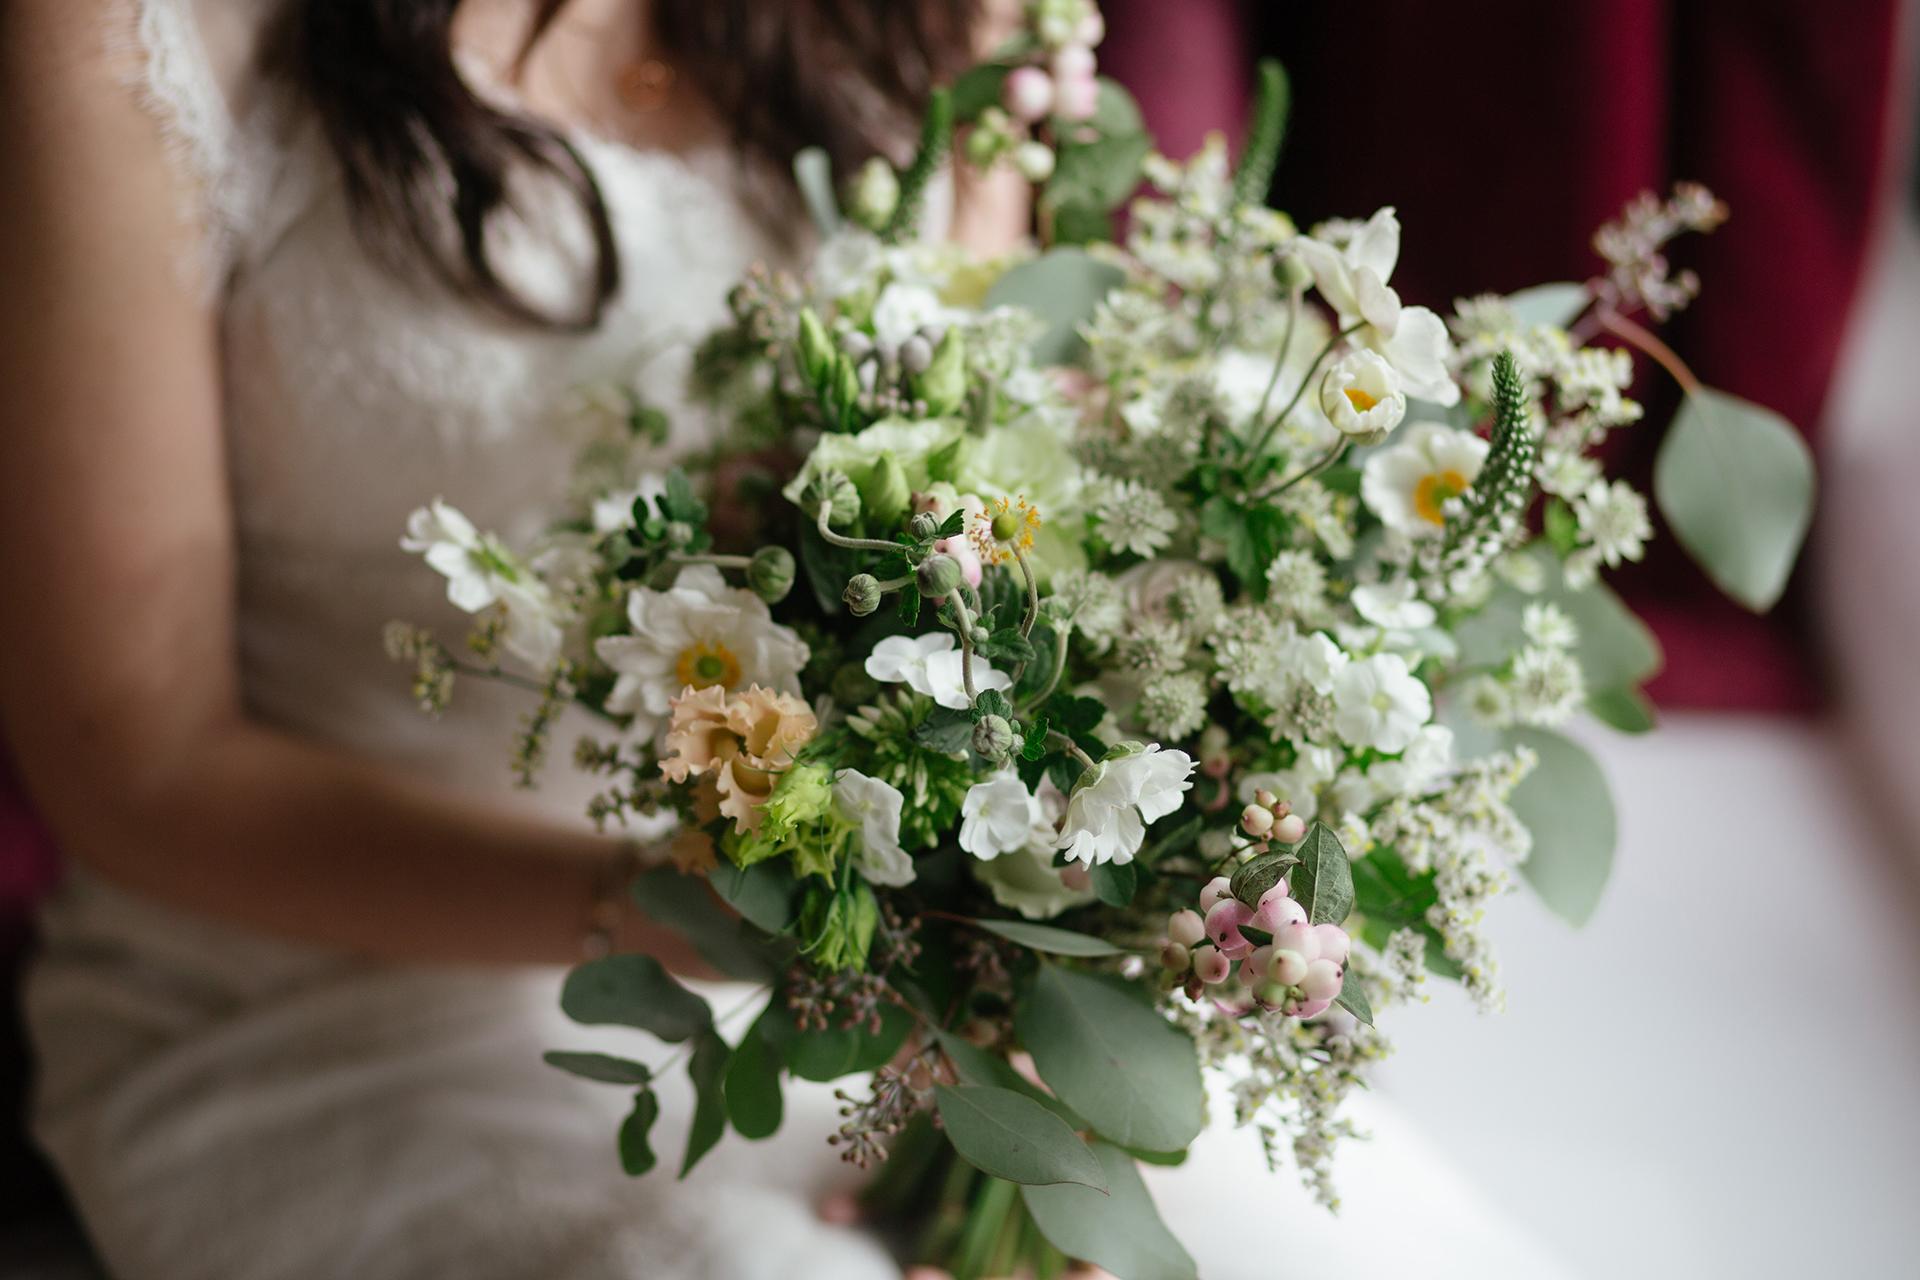 Kvinna håller bukett med blommor.